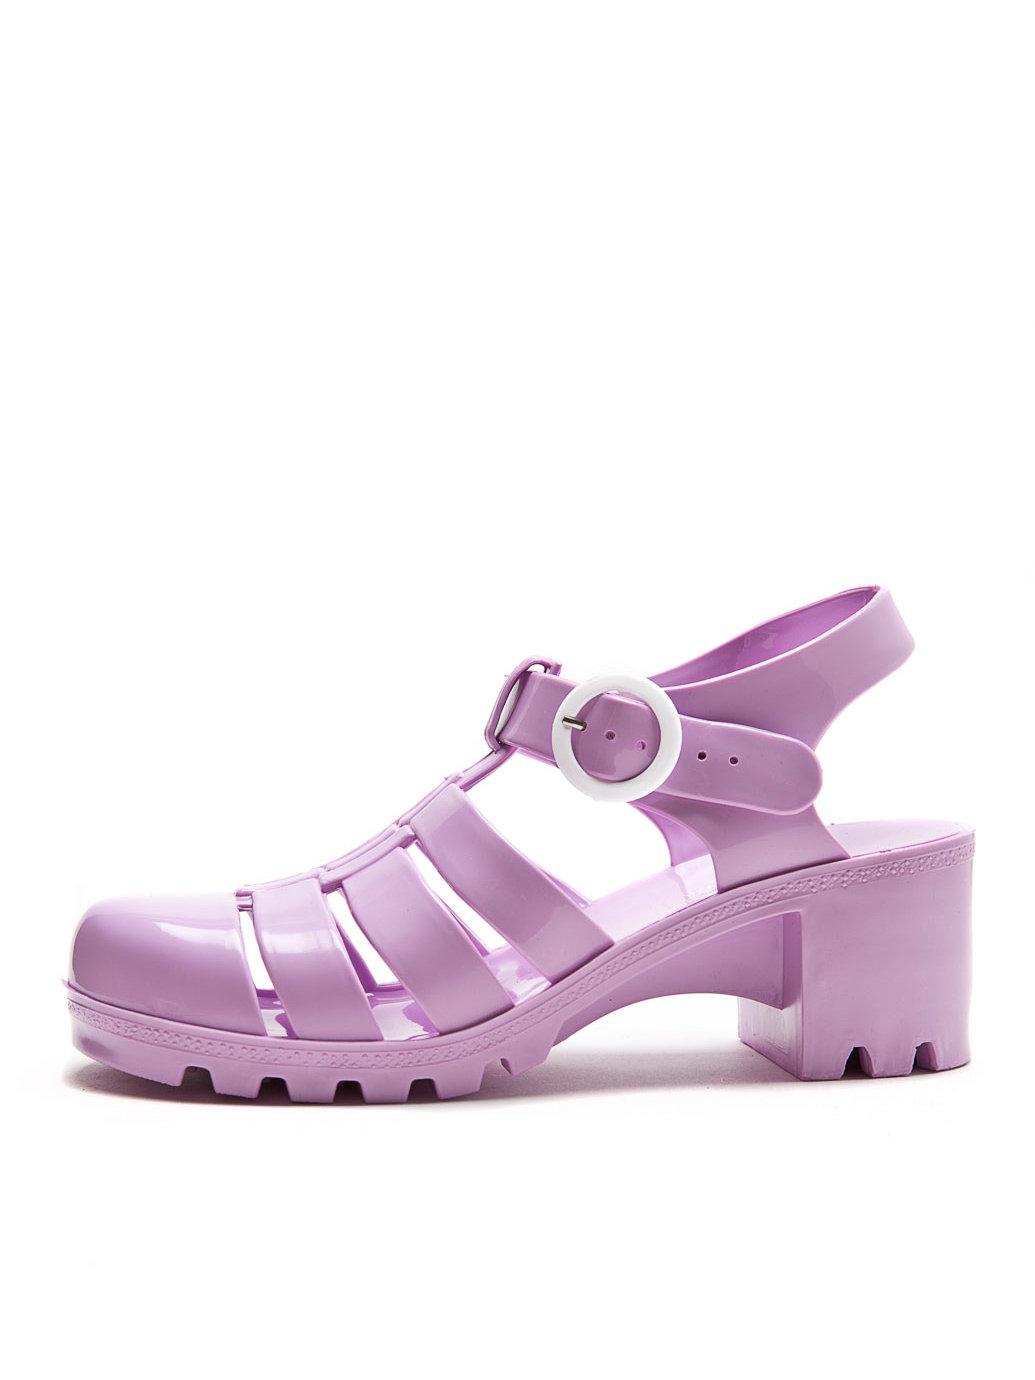 Woven Jelly Sandal | American Apparel